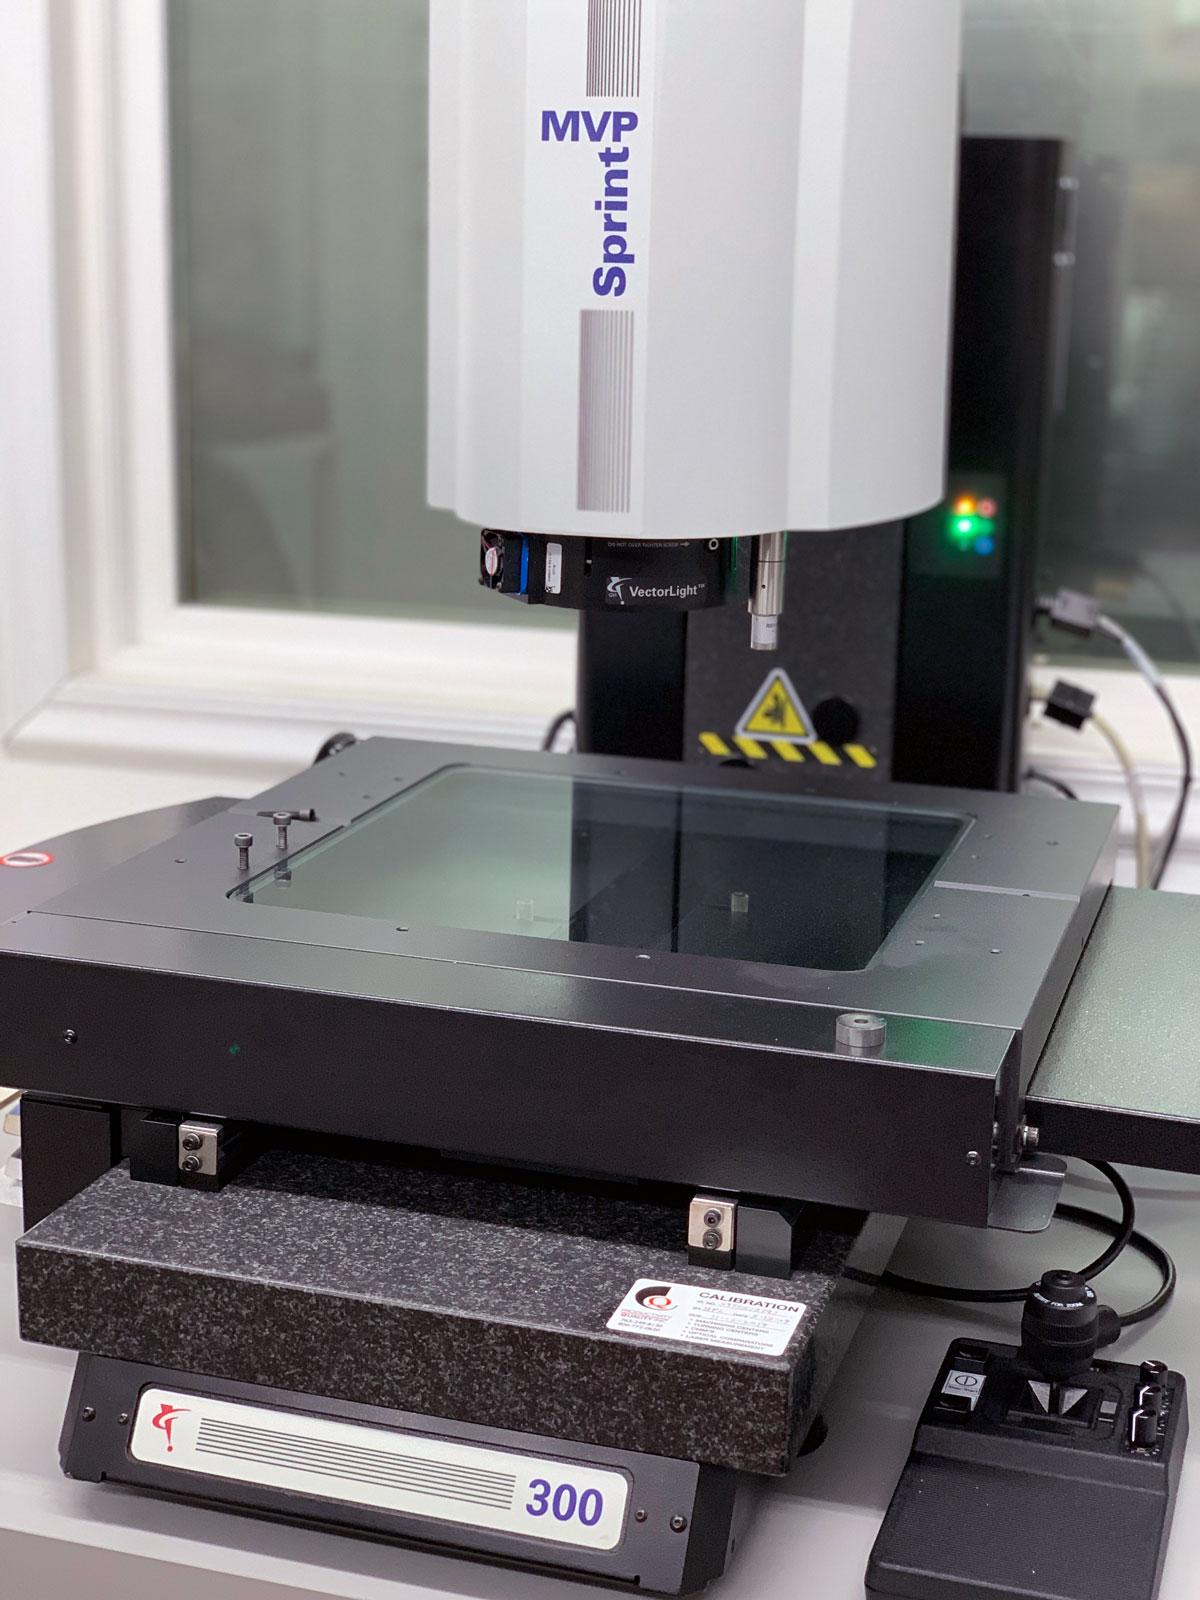 Sprintmvp 300 Inspection Equipment